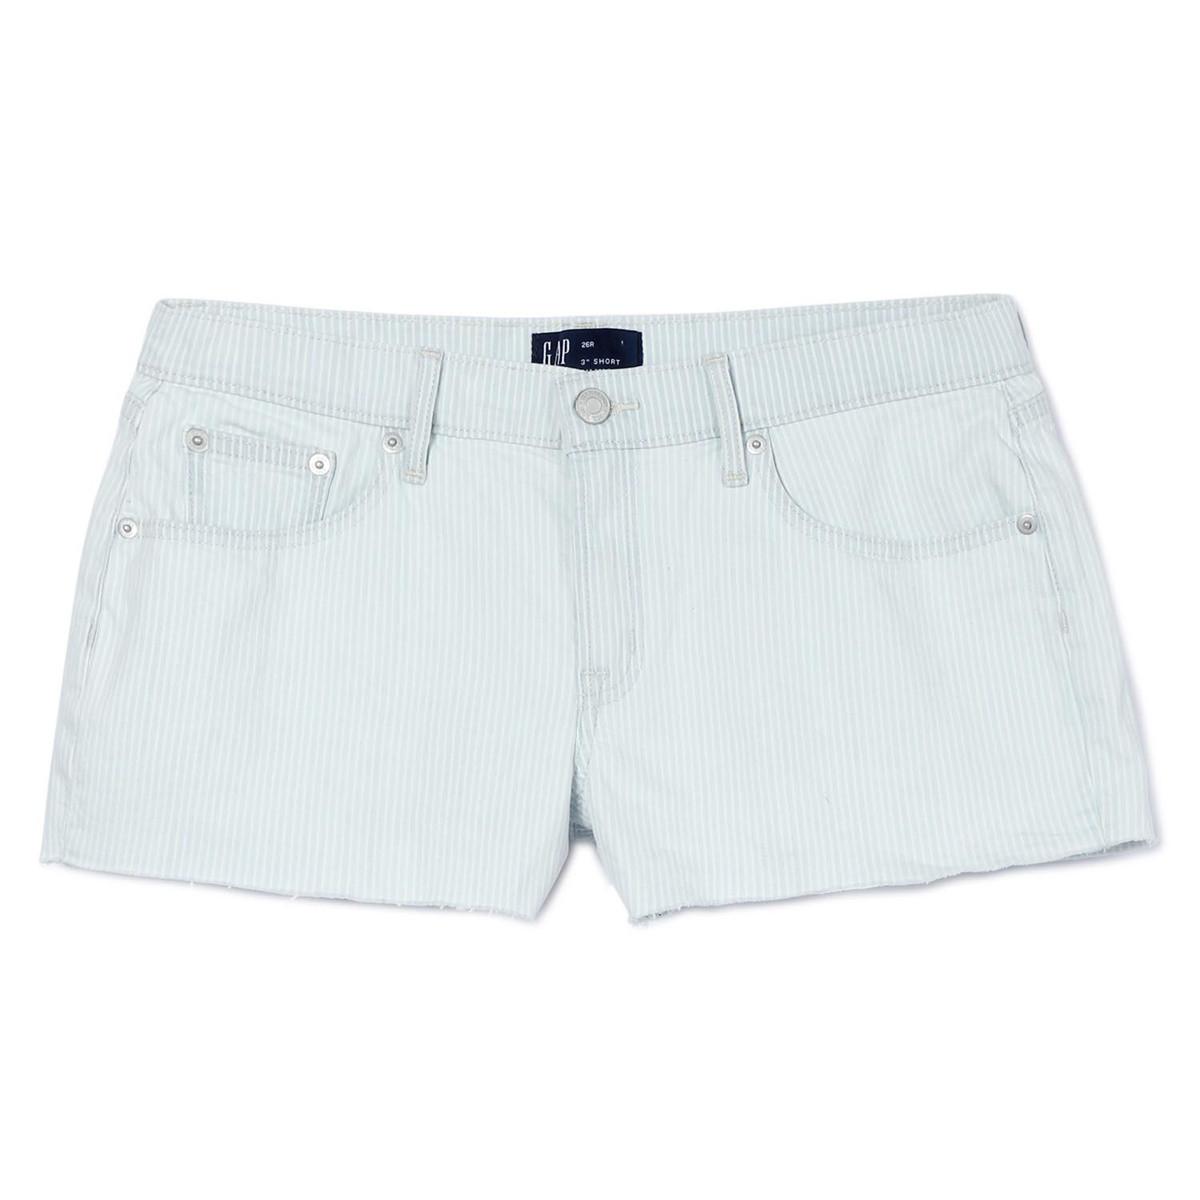 Gap 盖璞 466686 牛仔短裤